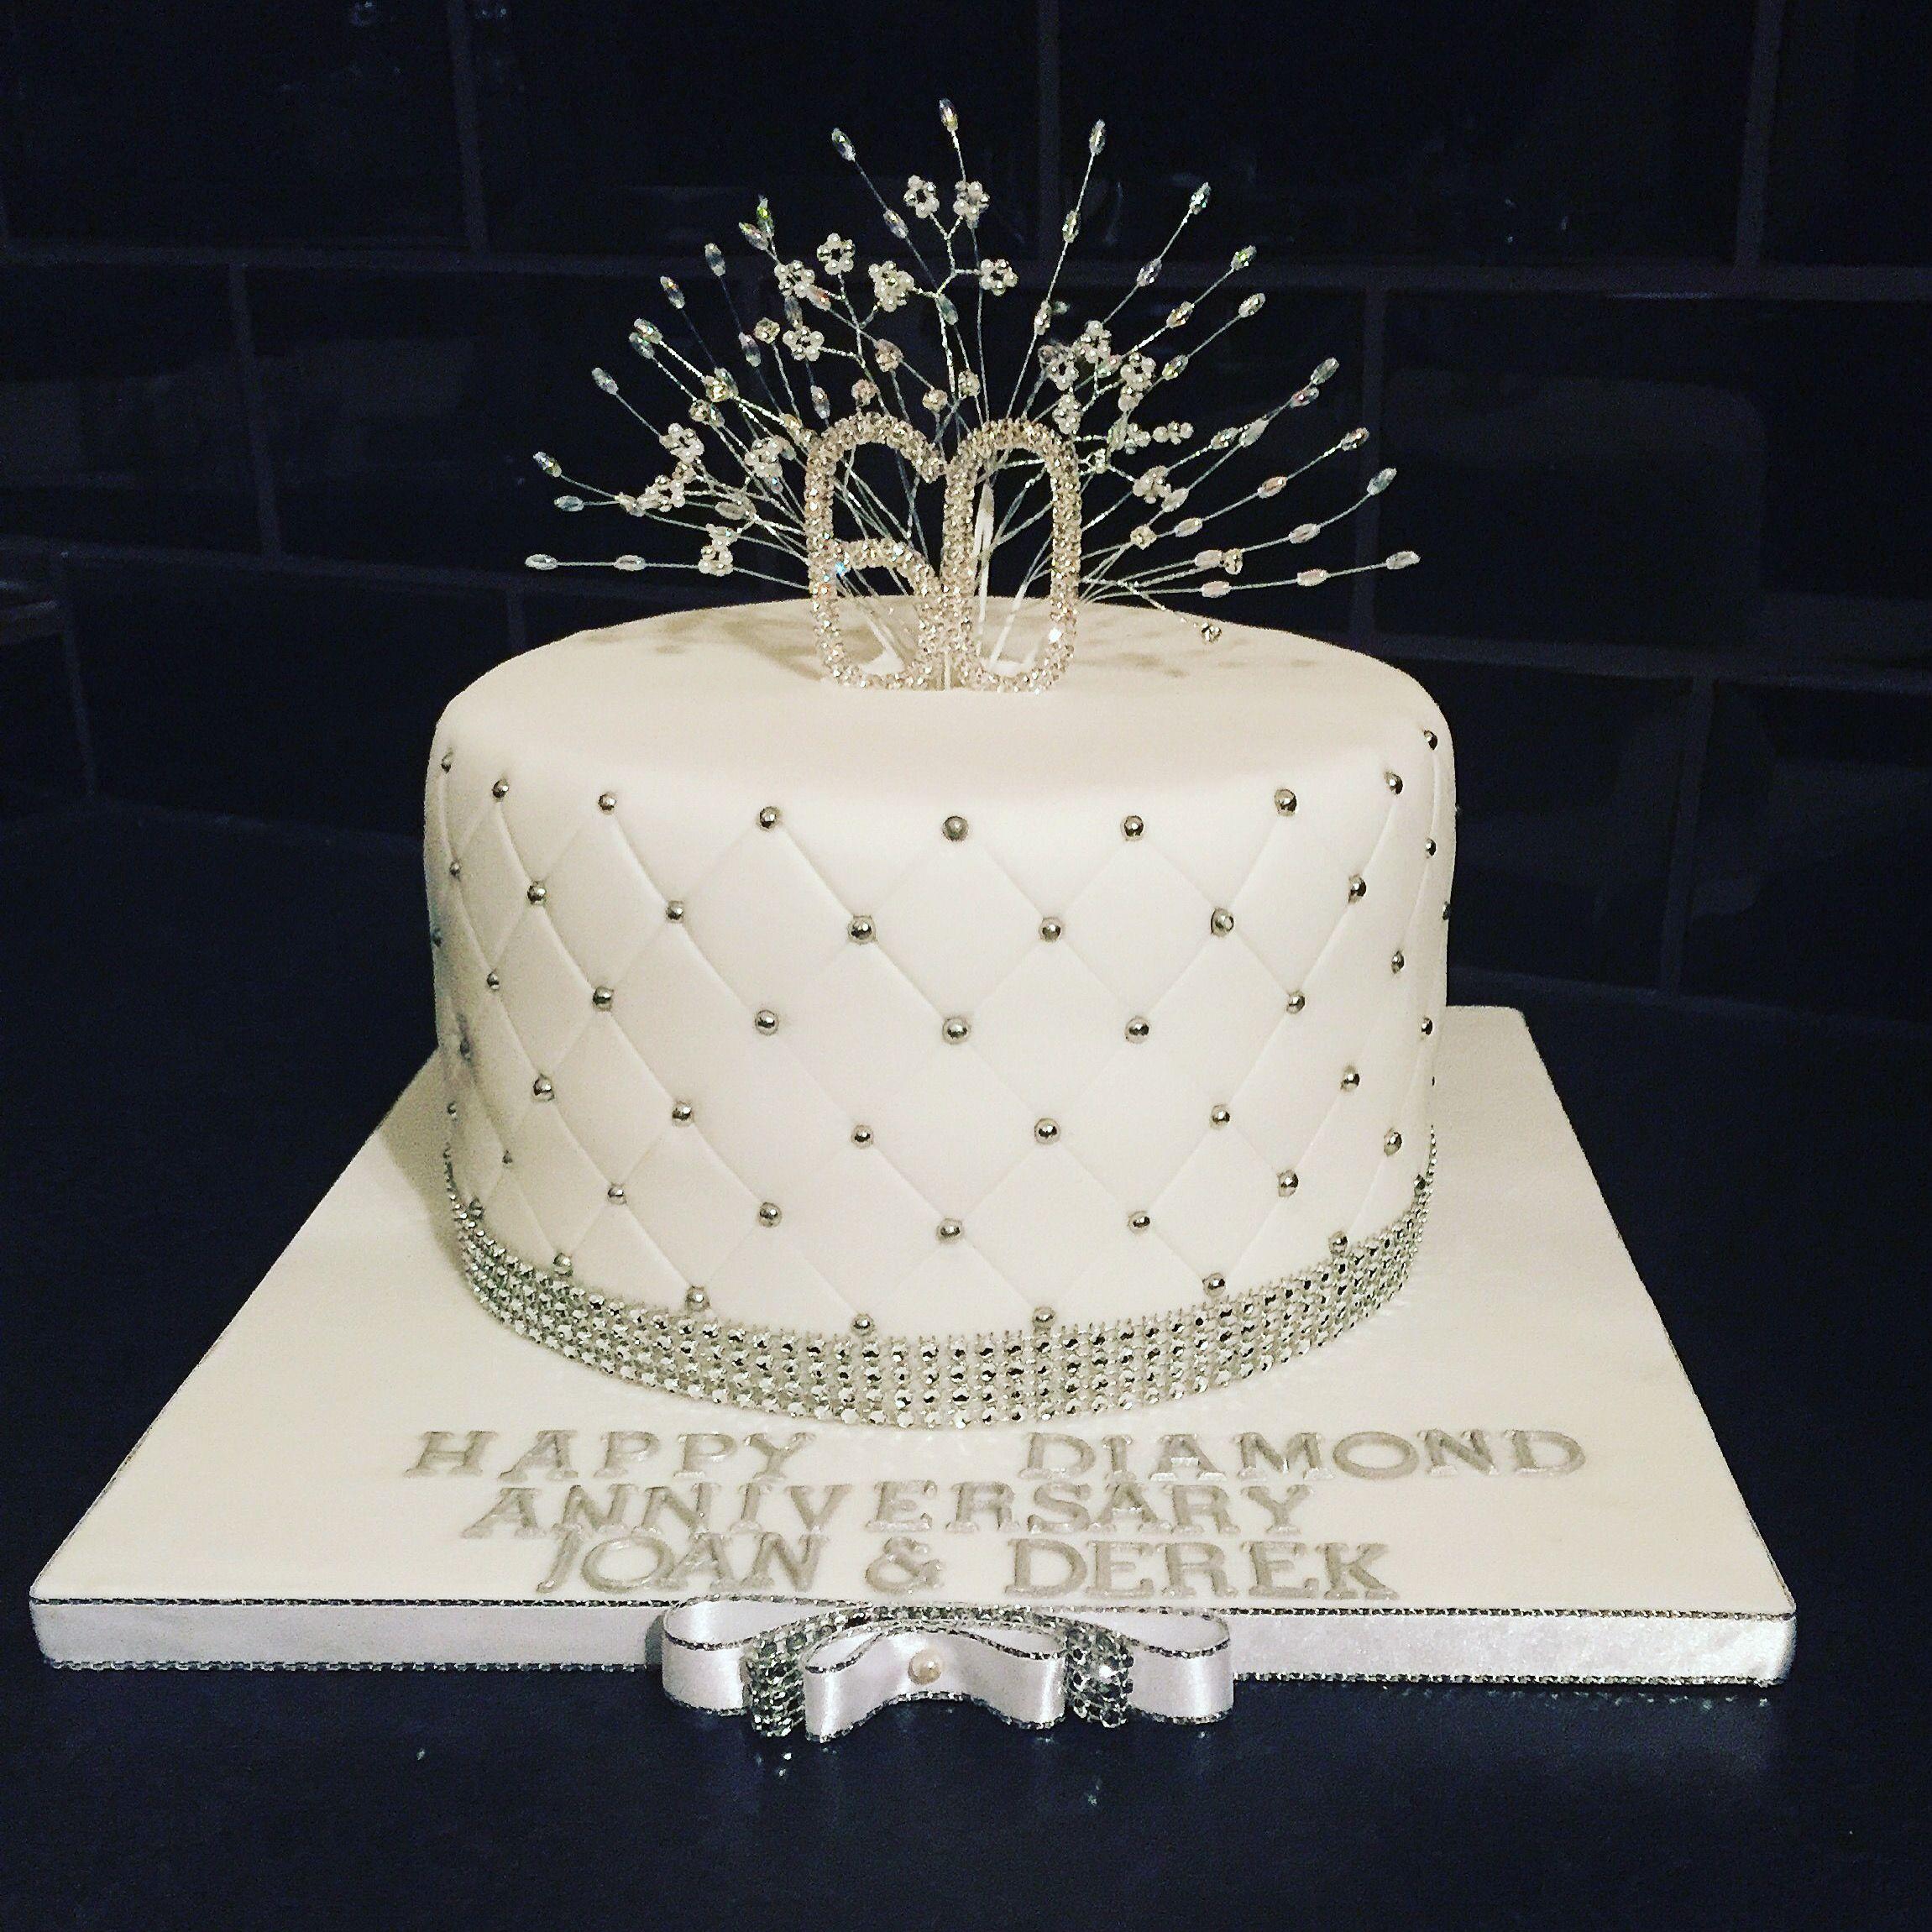 Diamond wedding anniversary cake | My cakes | Pinterest | Wedding ...